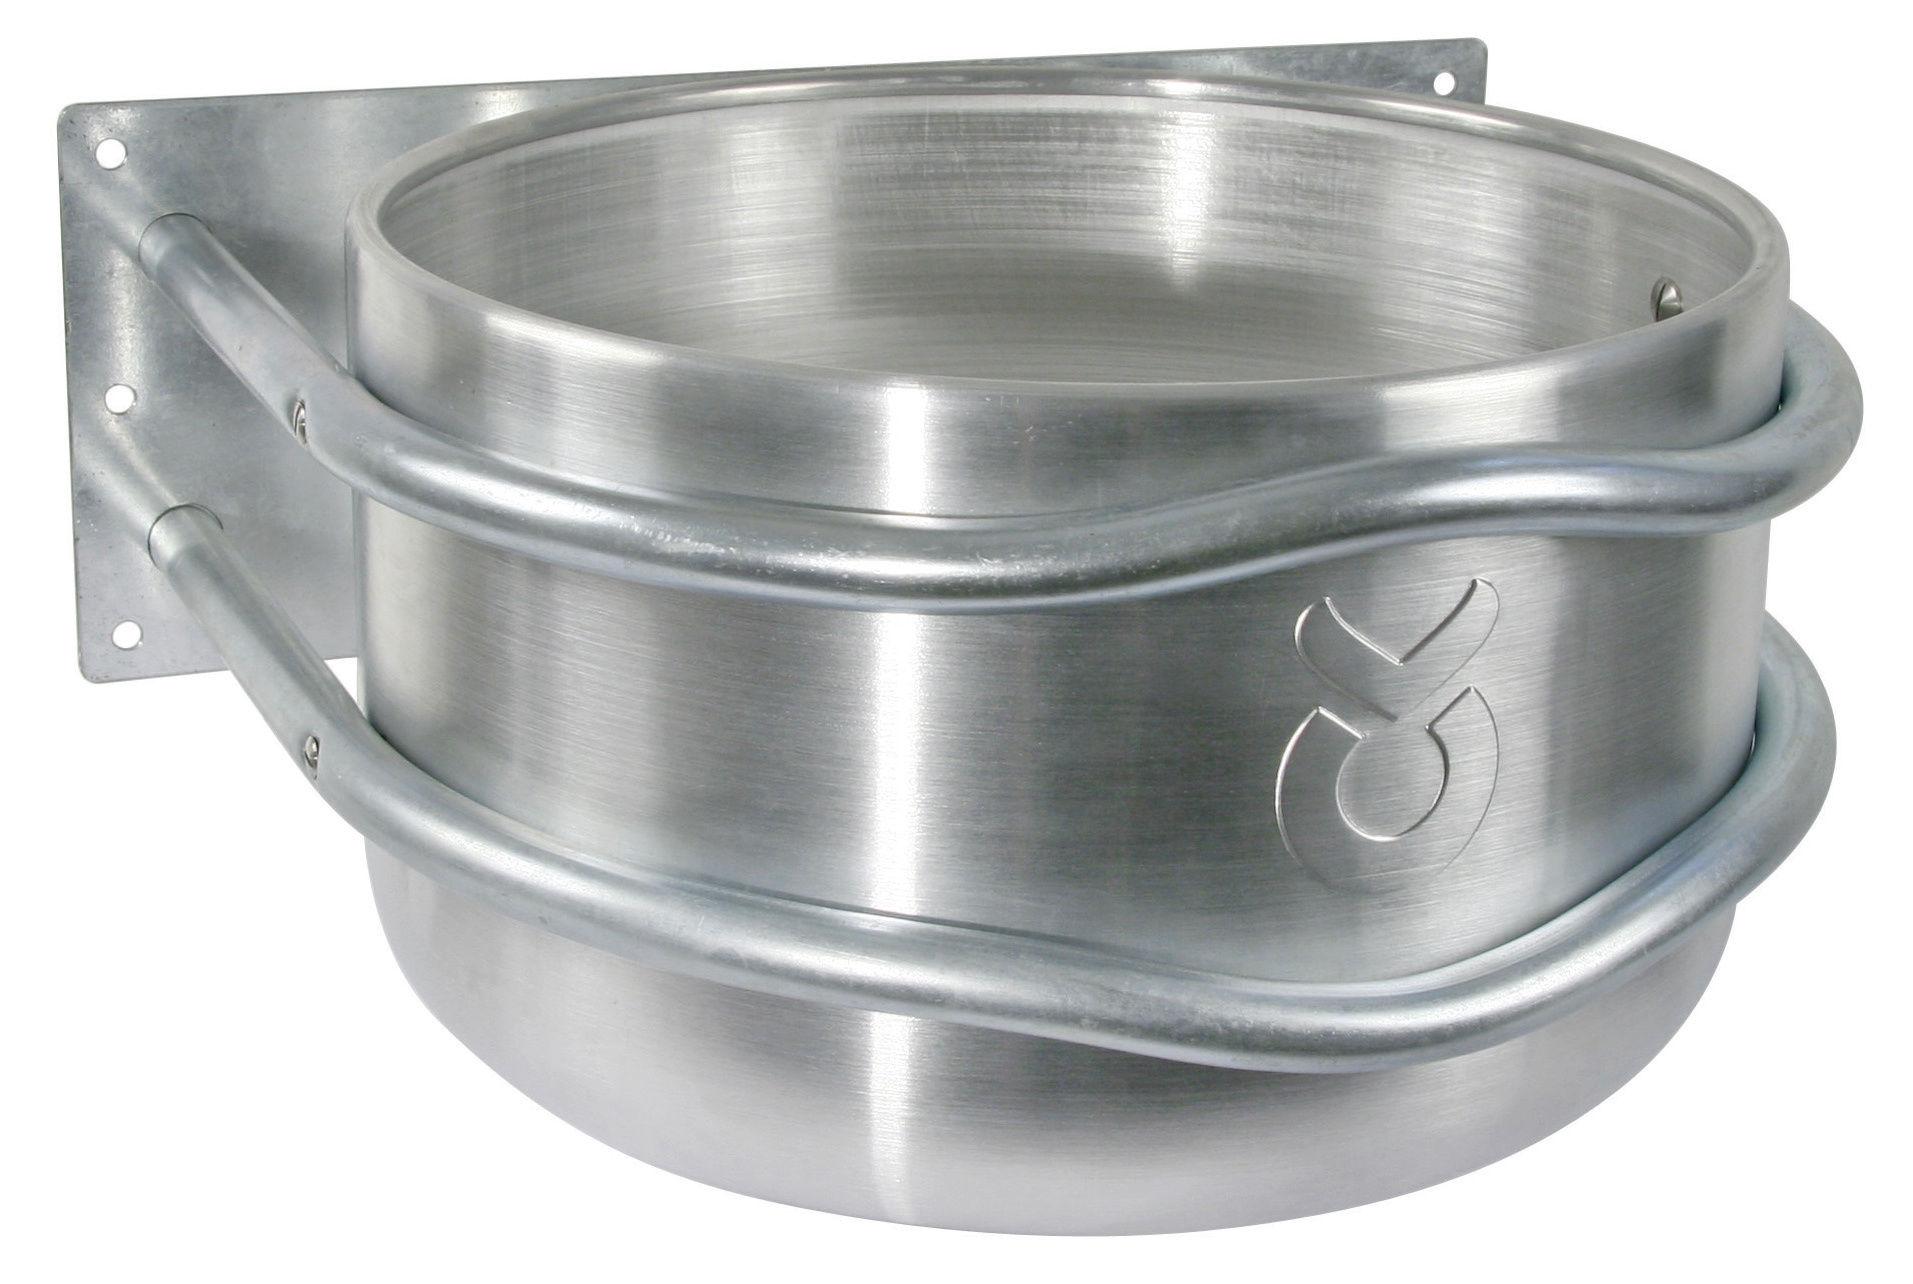 Futtertrog Aluminium, ca. 18l, mit Ablauf